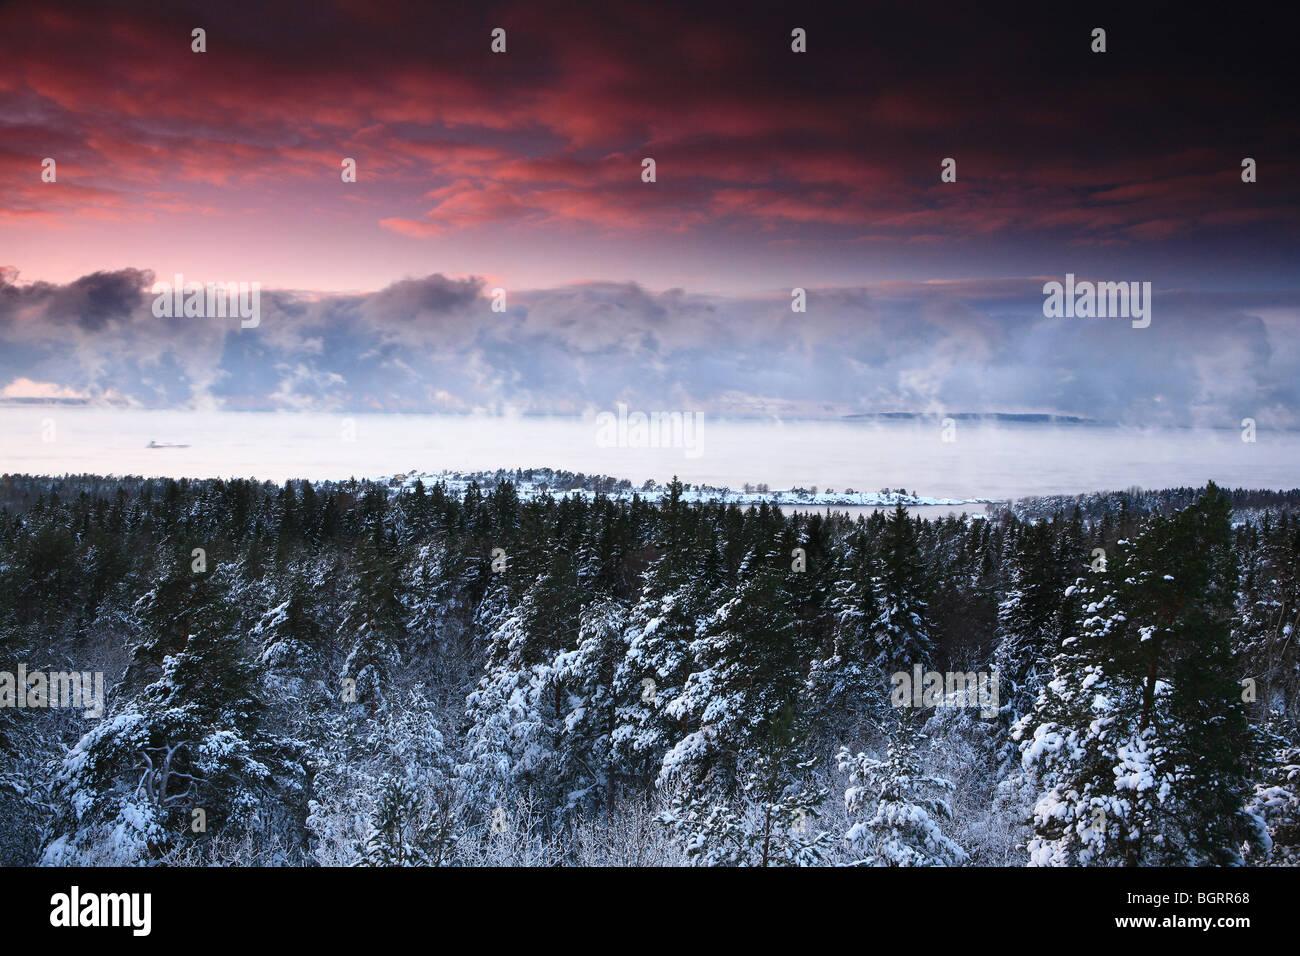 Winter landscape seen from Vardåsen in Rygge kommune, Østfold fylke, Norway. - Stock Image